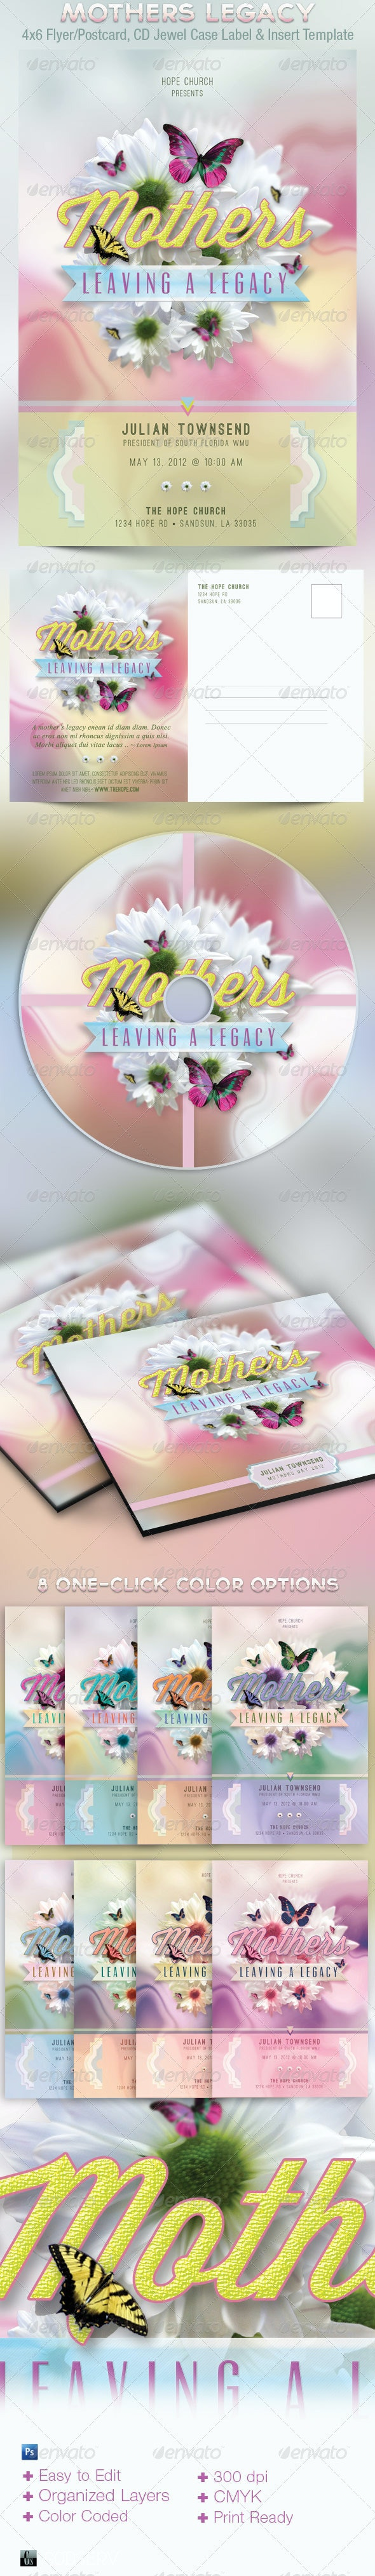 Mothers Legacy Church Flyer Postcard CD Template - Church Flyers